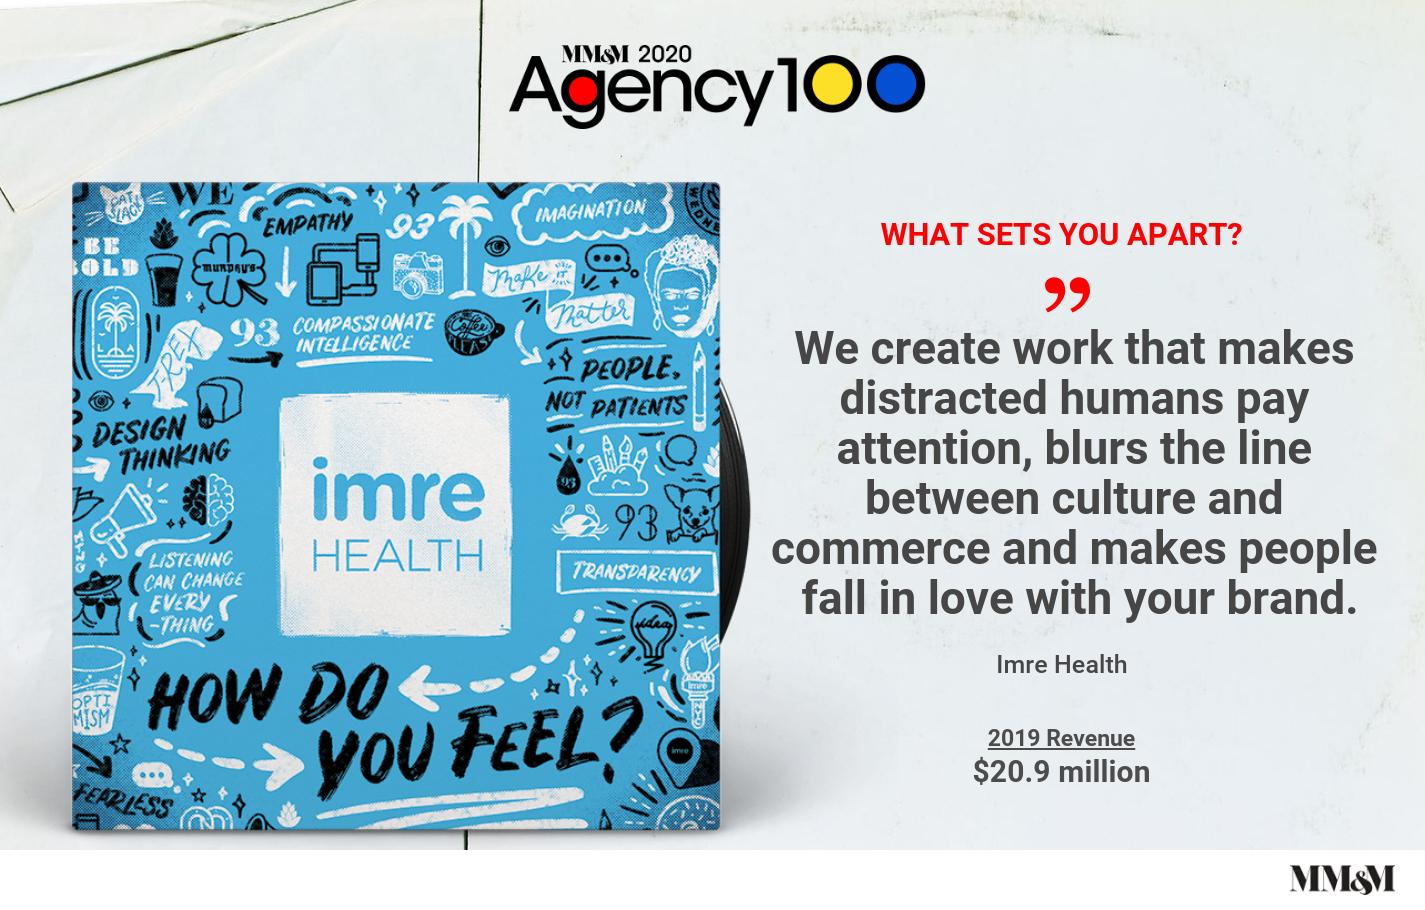 Agency 100 2020: Imre Health